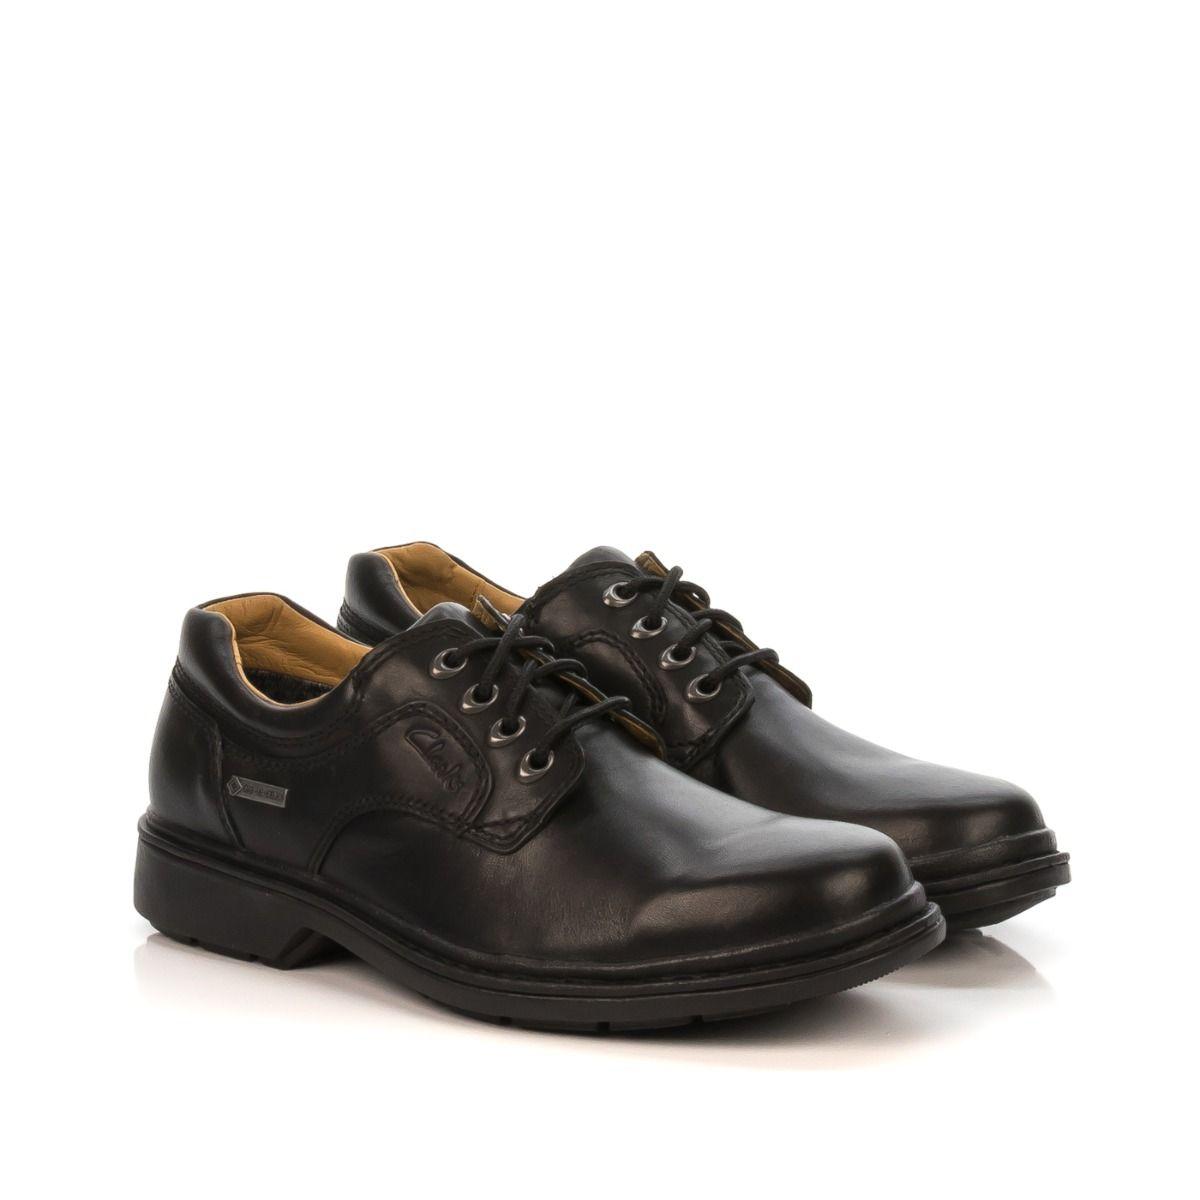 shoe Tex® pelle Gtx Center Lo gore Uomo Nero Clarks scarpa Rockie zTw7R7